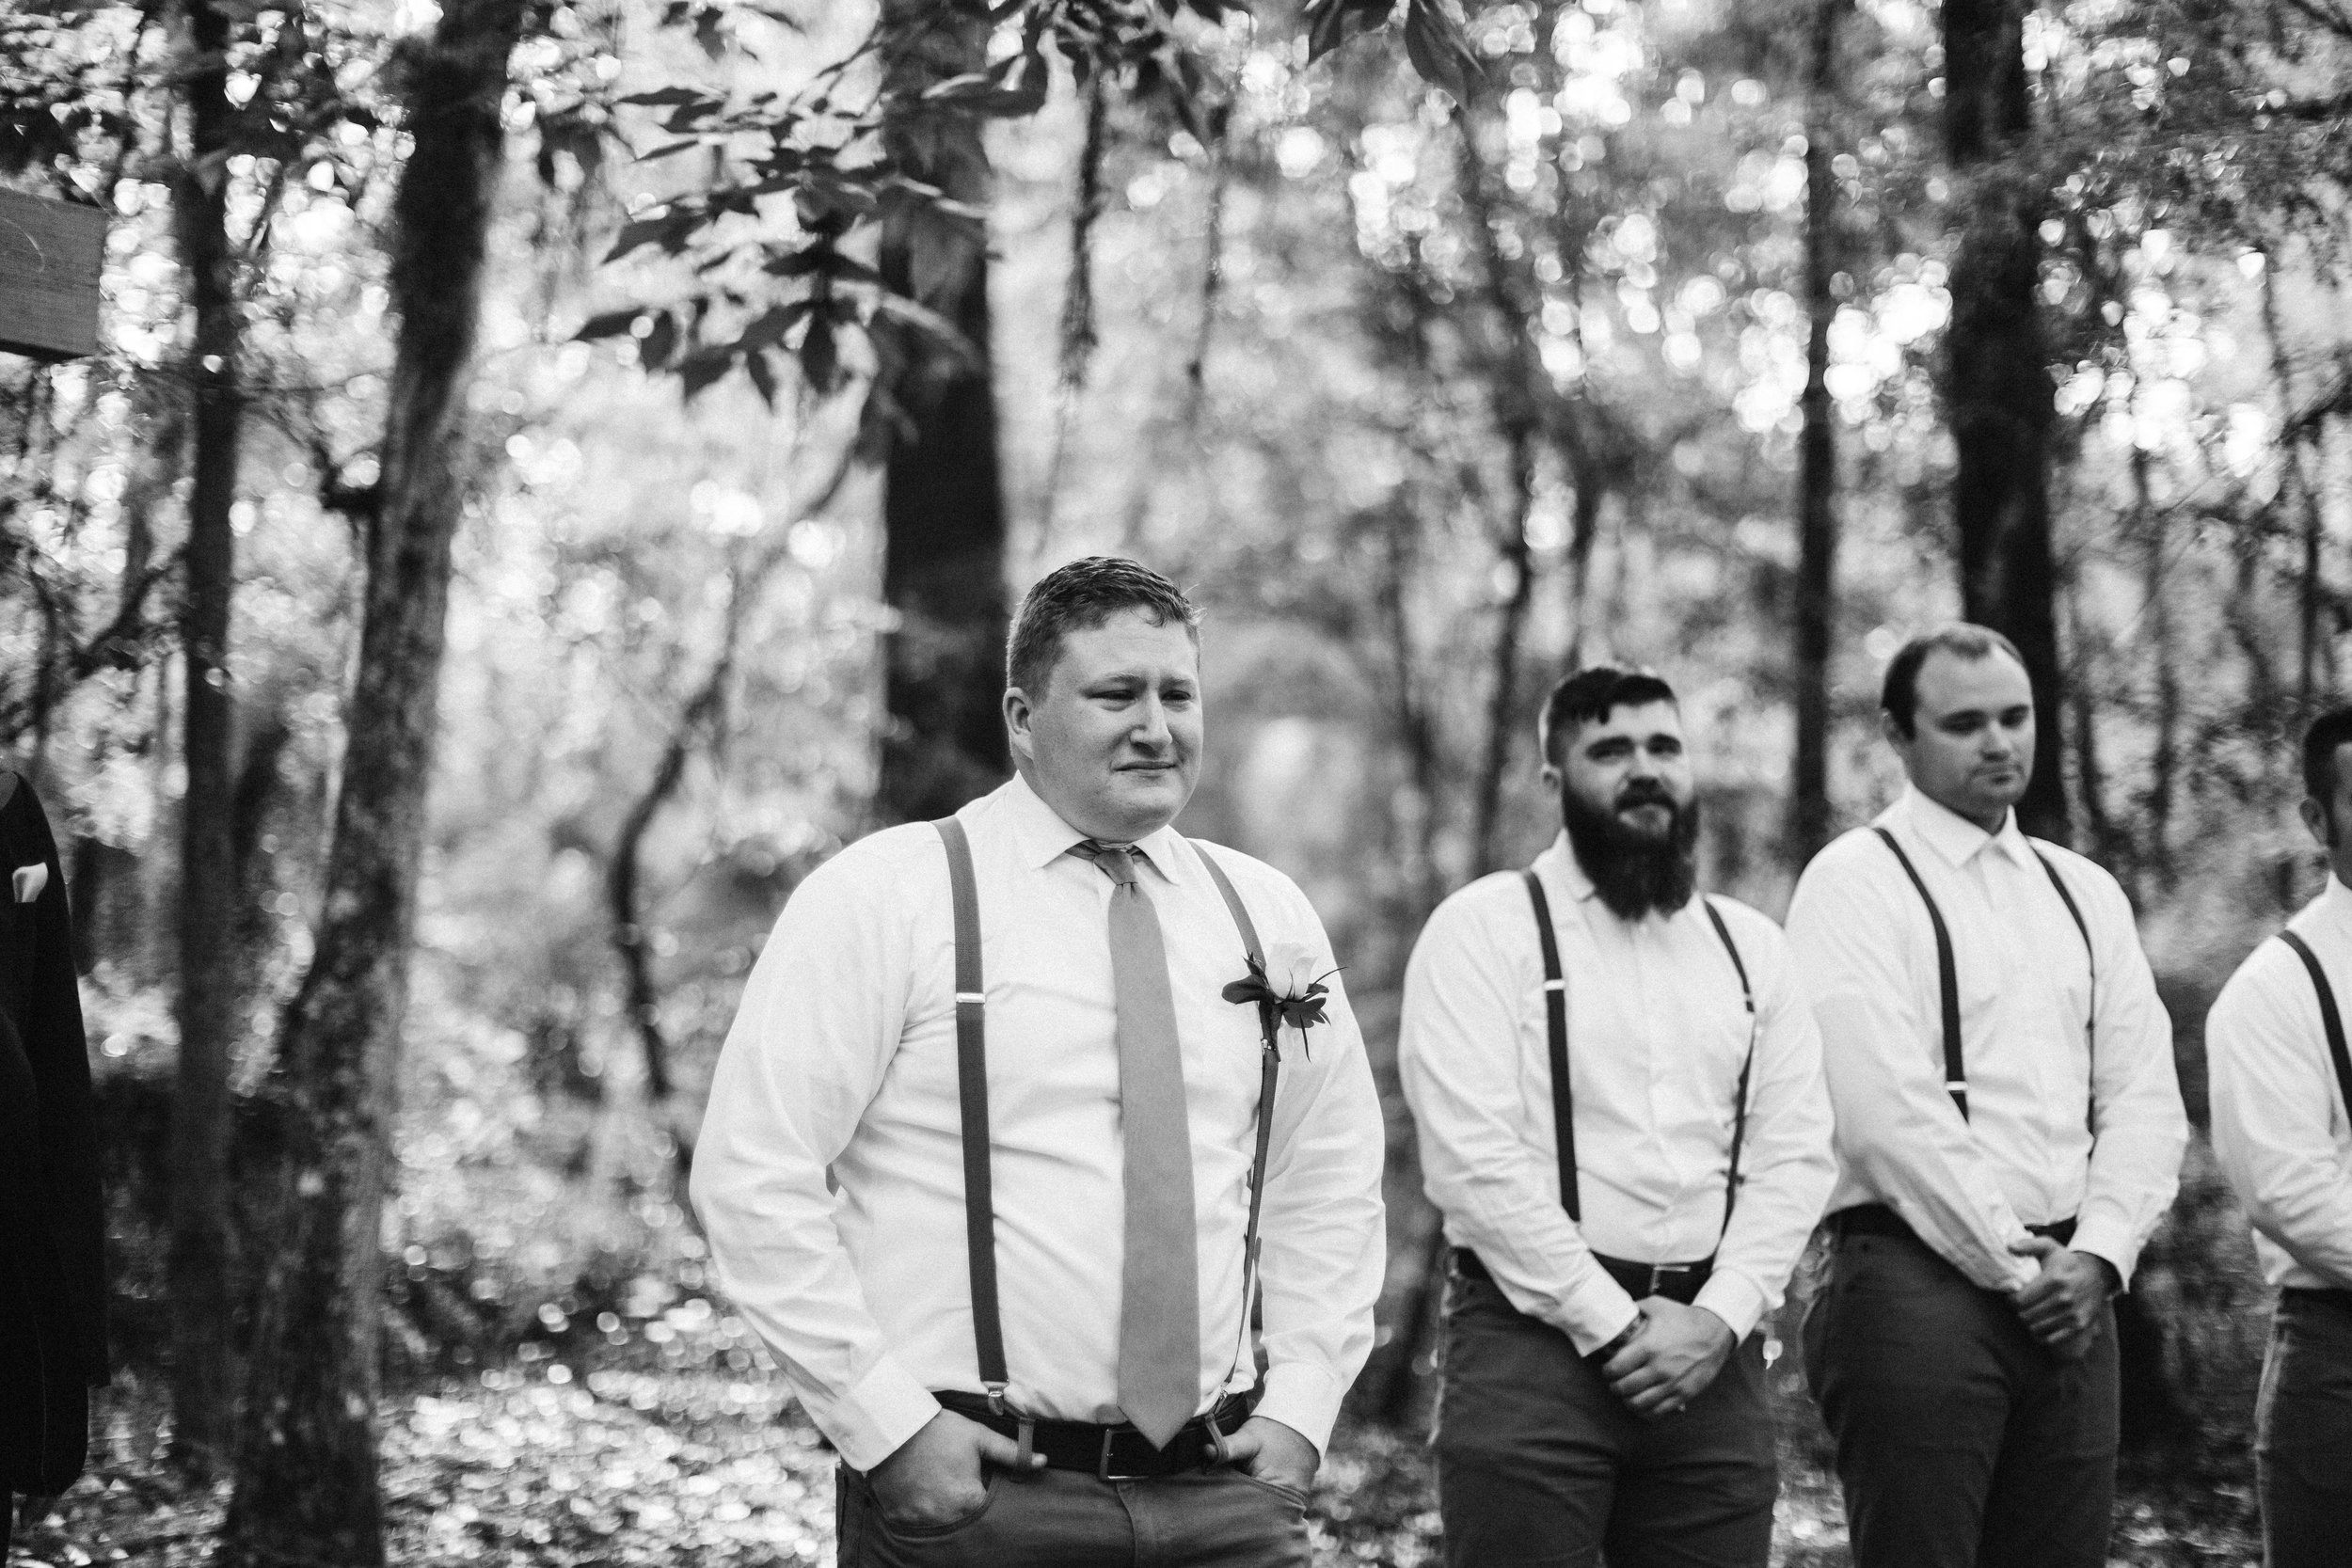 Griffin Wedding October Oaks Farm-309.jpg